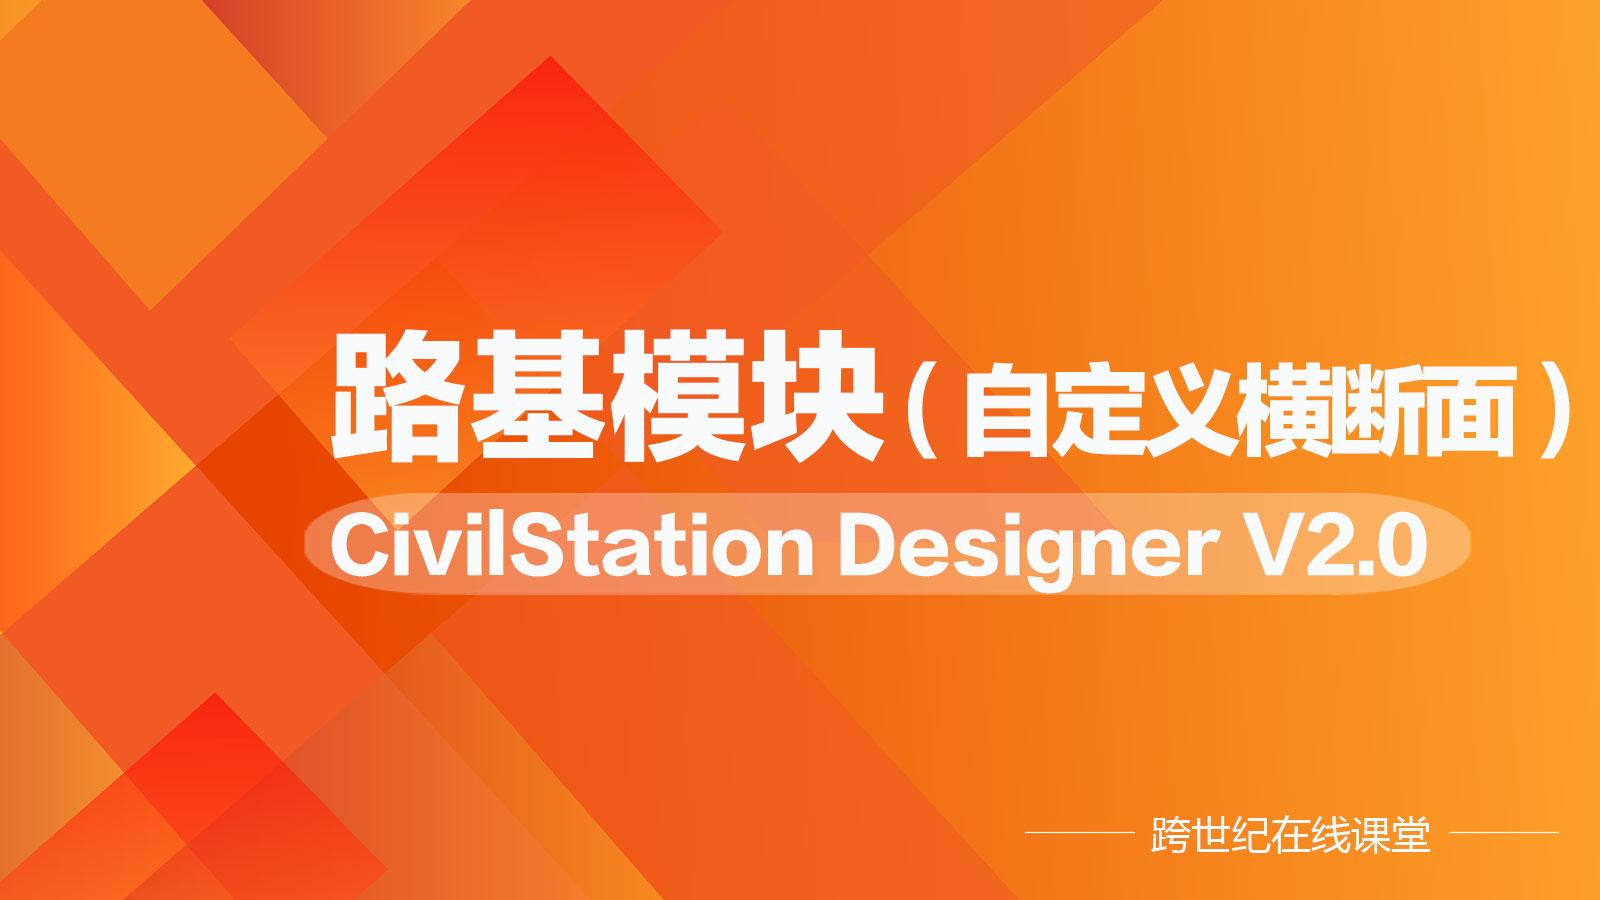 正向设计BIM软件CivilStation Designer路基自定义横断面